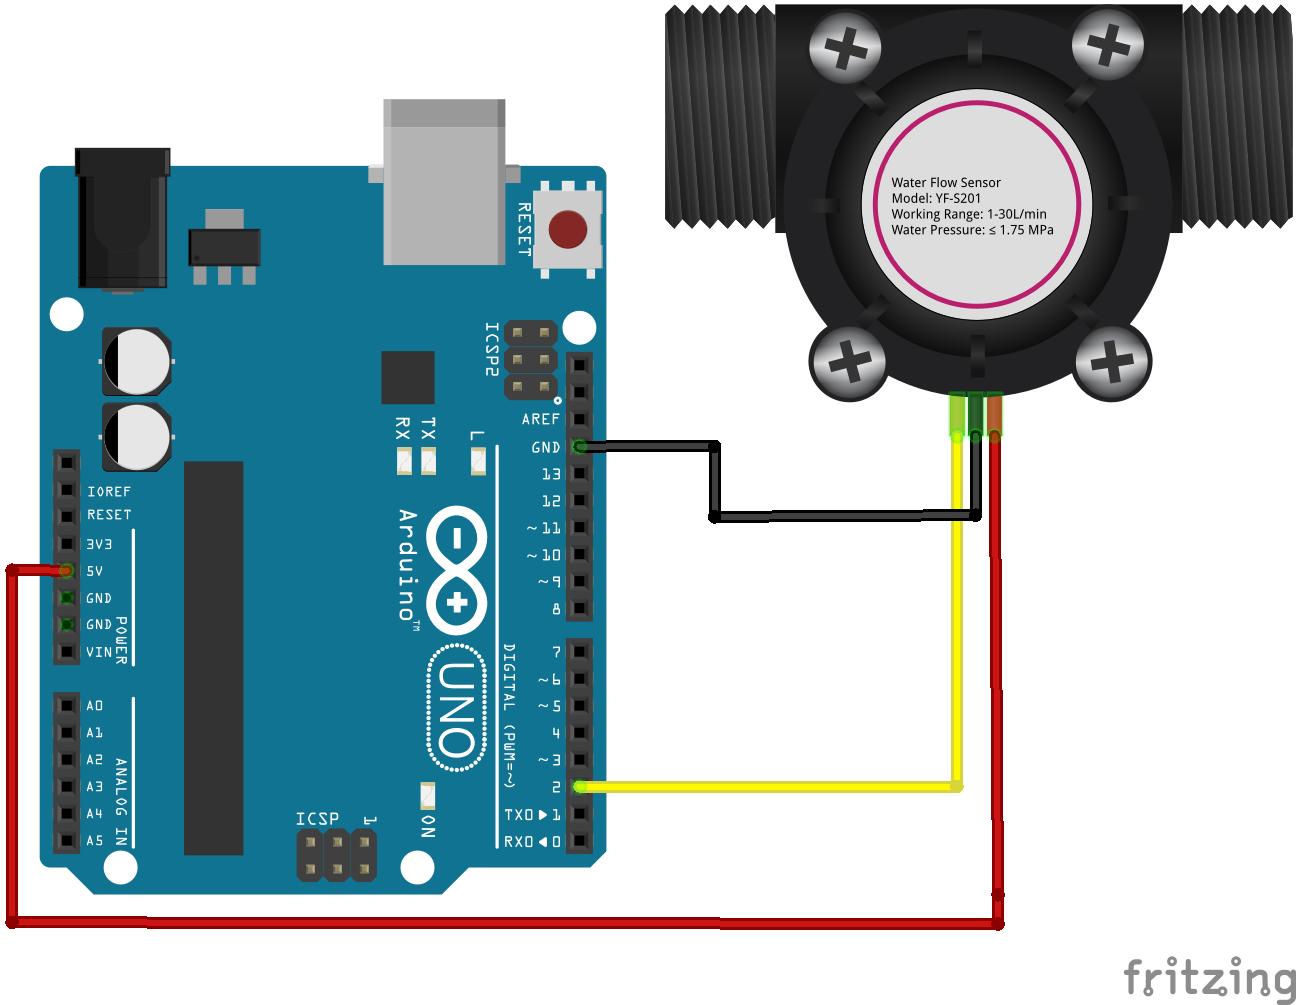 YF-S201 wate flow sensor interfacing with Arduino connection diagram